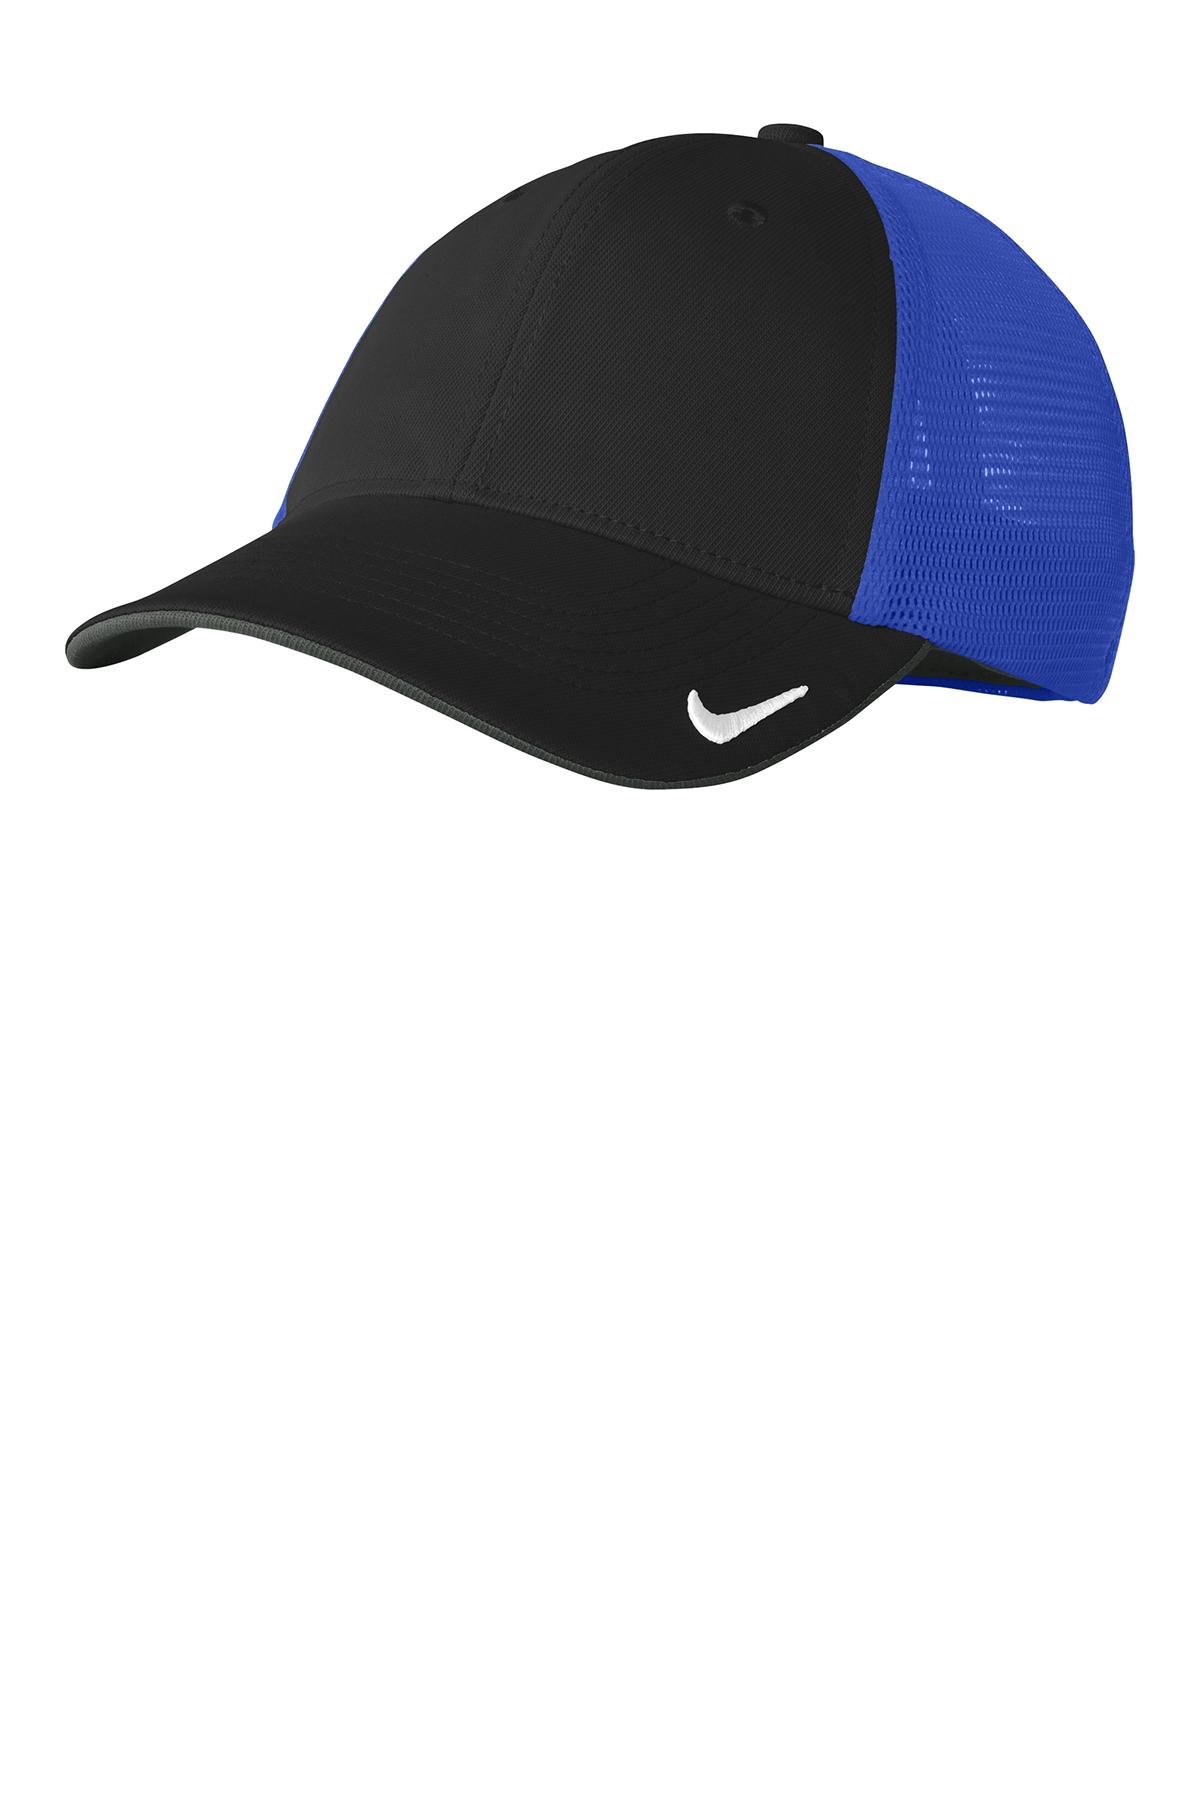 Nike Golf NKAO9293 - Dri-FIT Mesh Back Cap